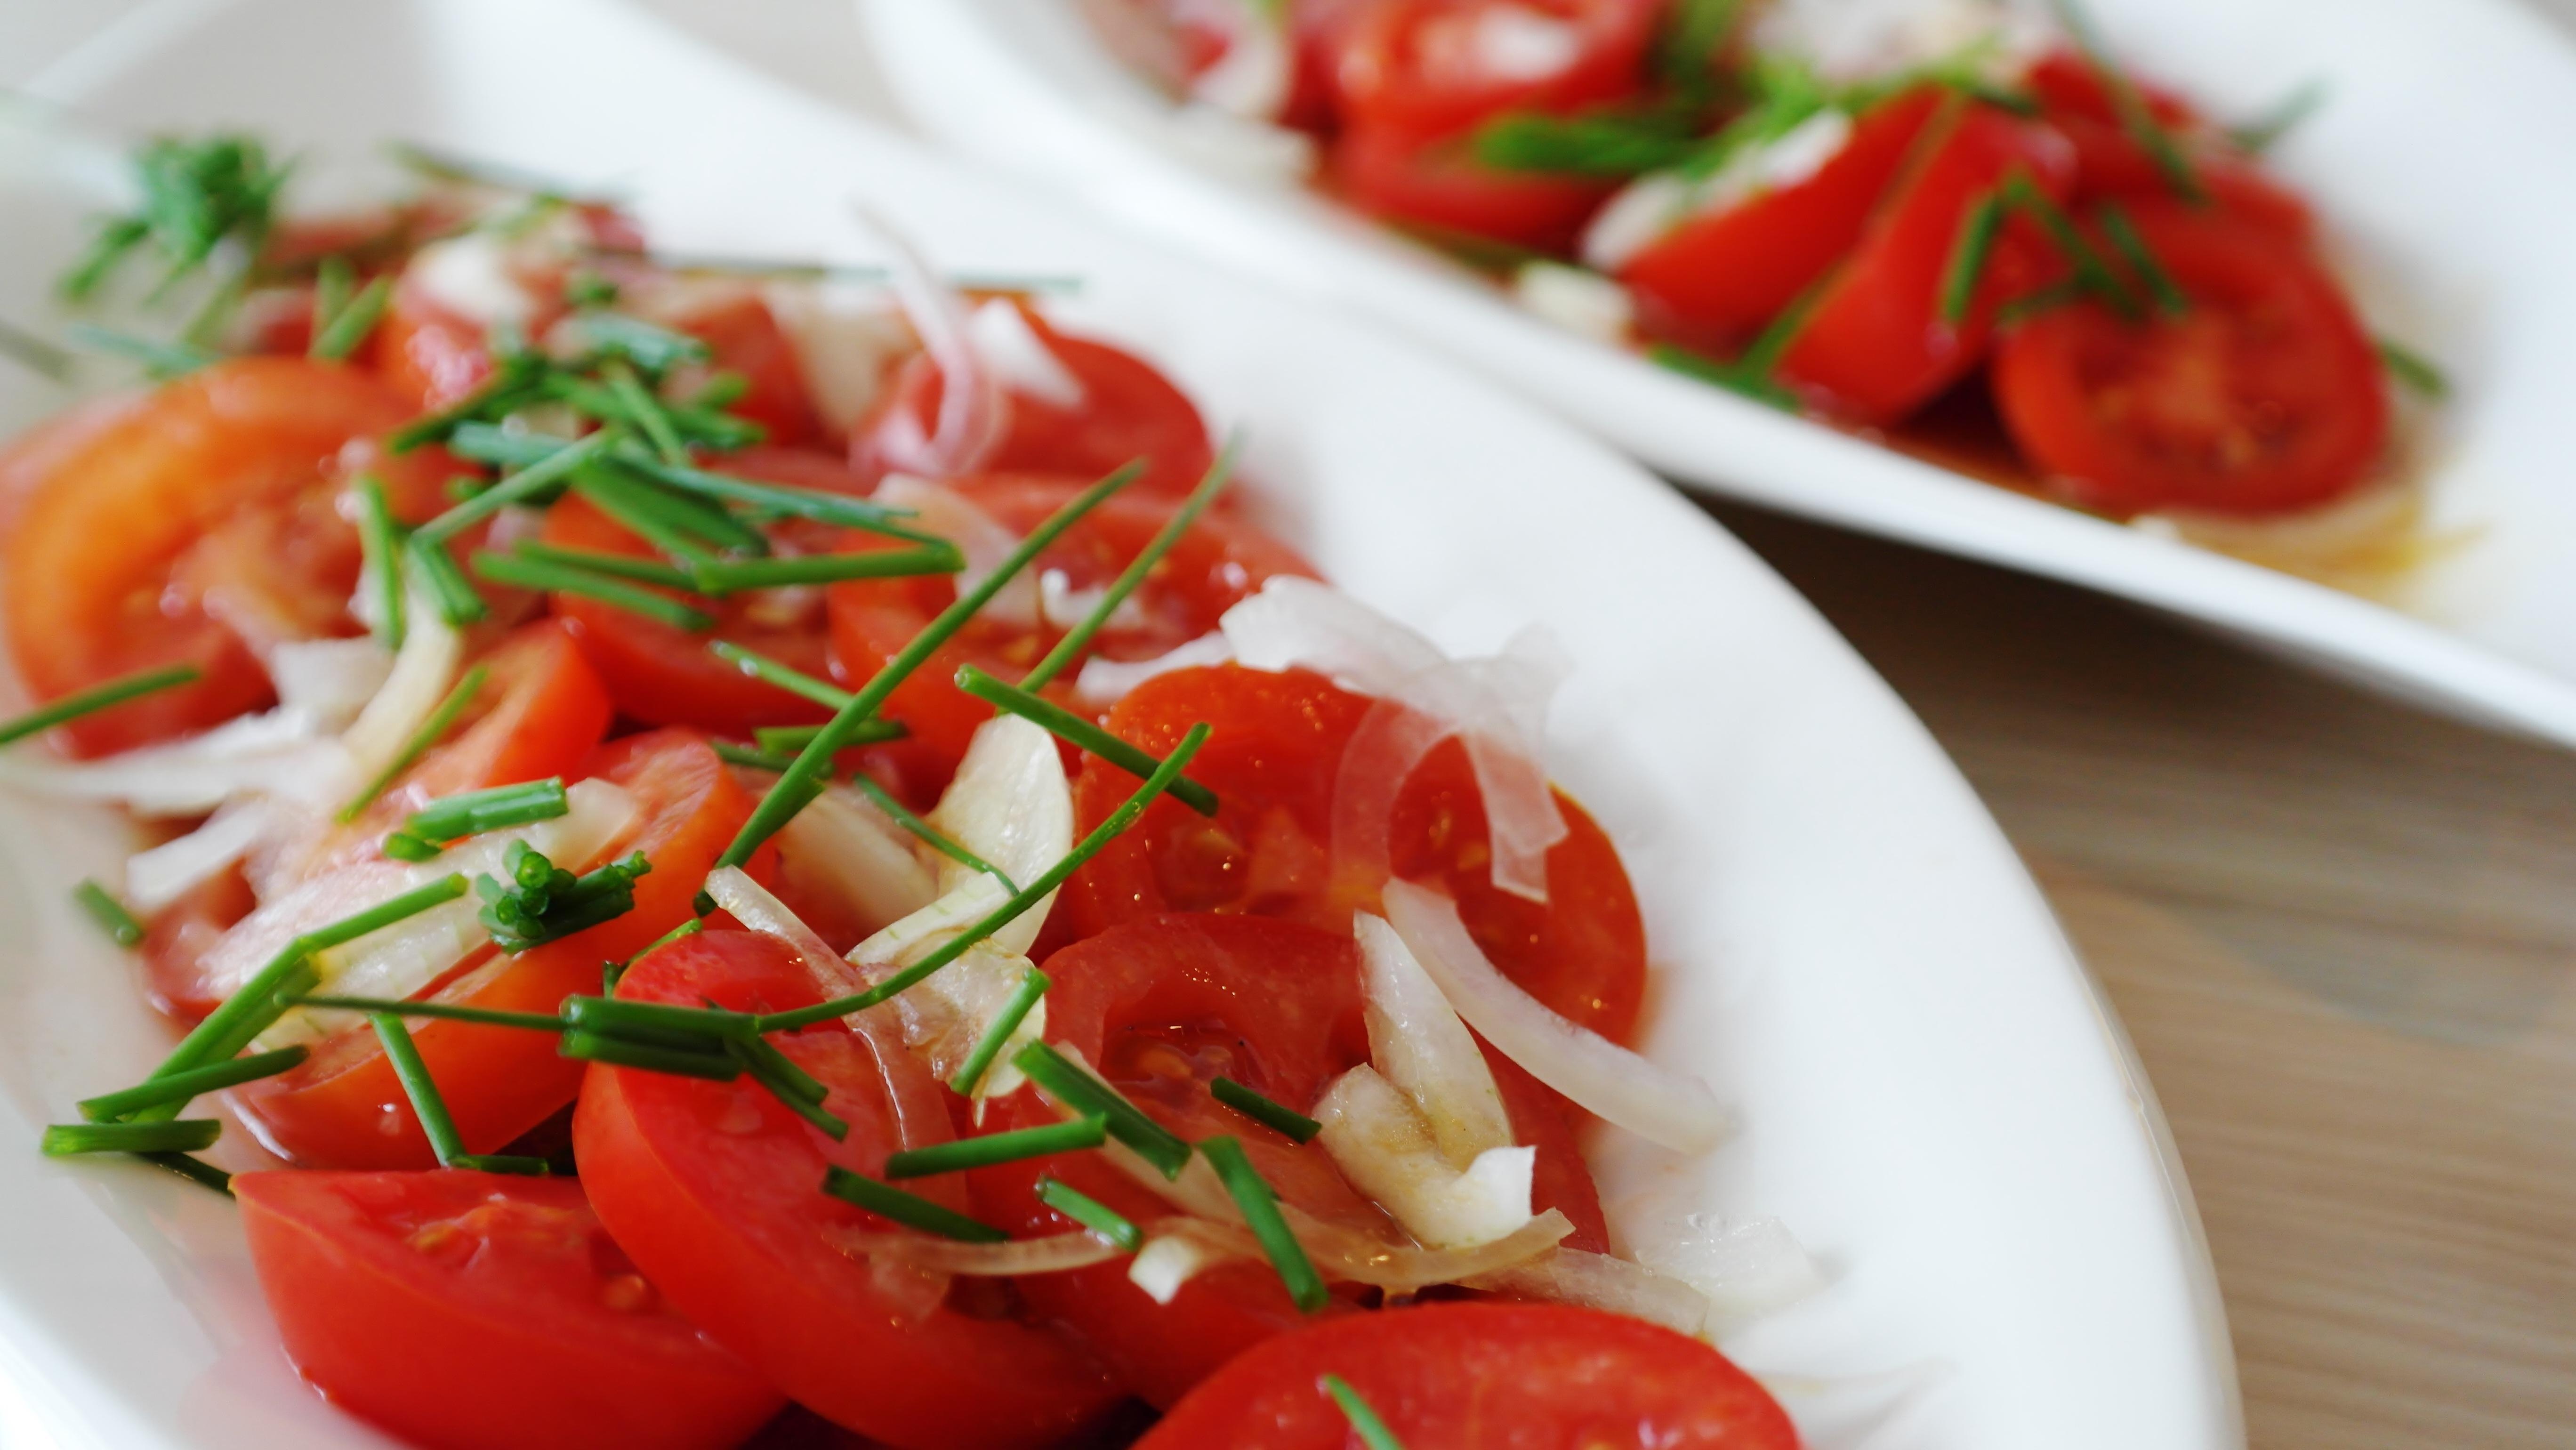 Gambar Menanam Buah Makan Hidangan Makanan Merah Menghasilkan Sayur Mayur Dapur Sehat Masakan Ba Sayuran Lezat Vegetarian Frisch